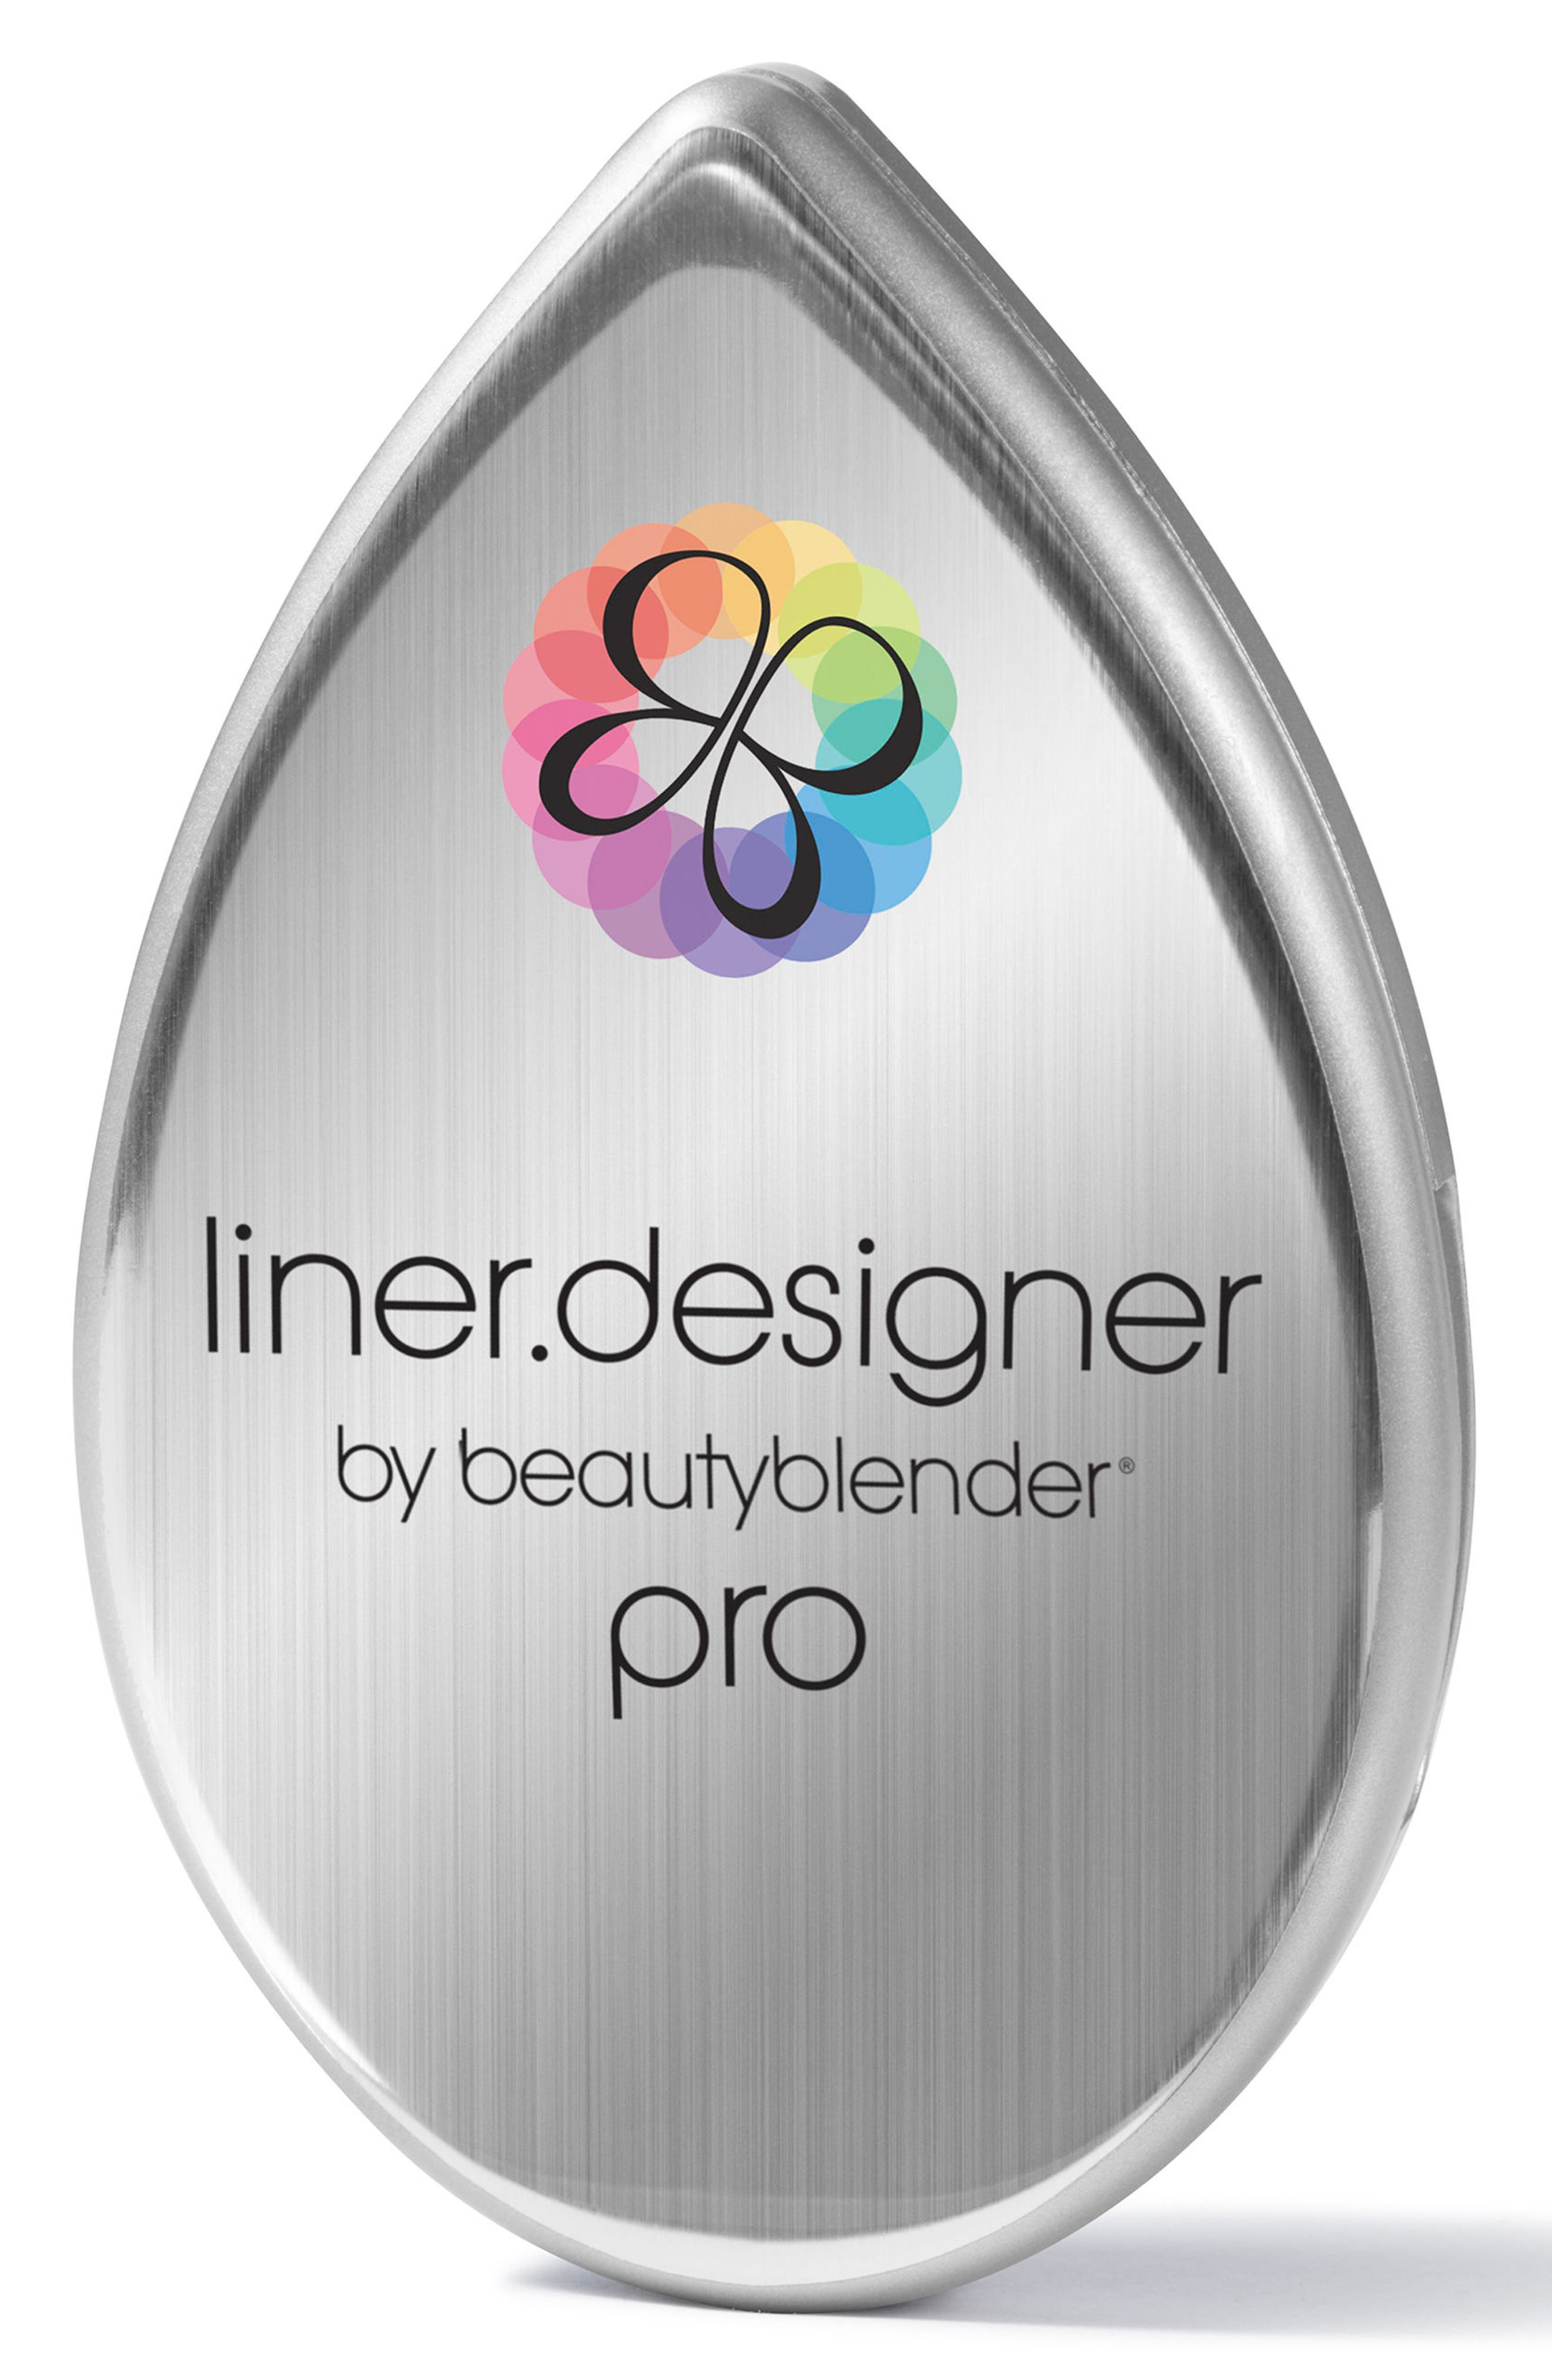 beautyblender® 'liner.designer pro' Eyeliner Application Tool